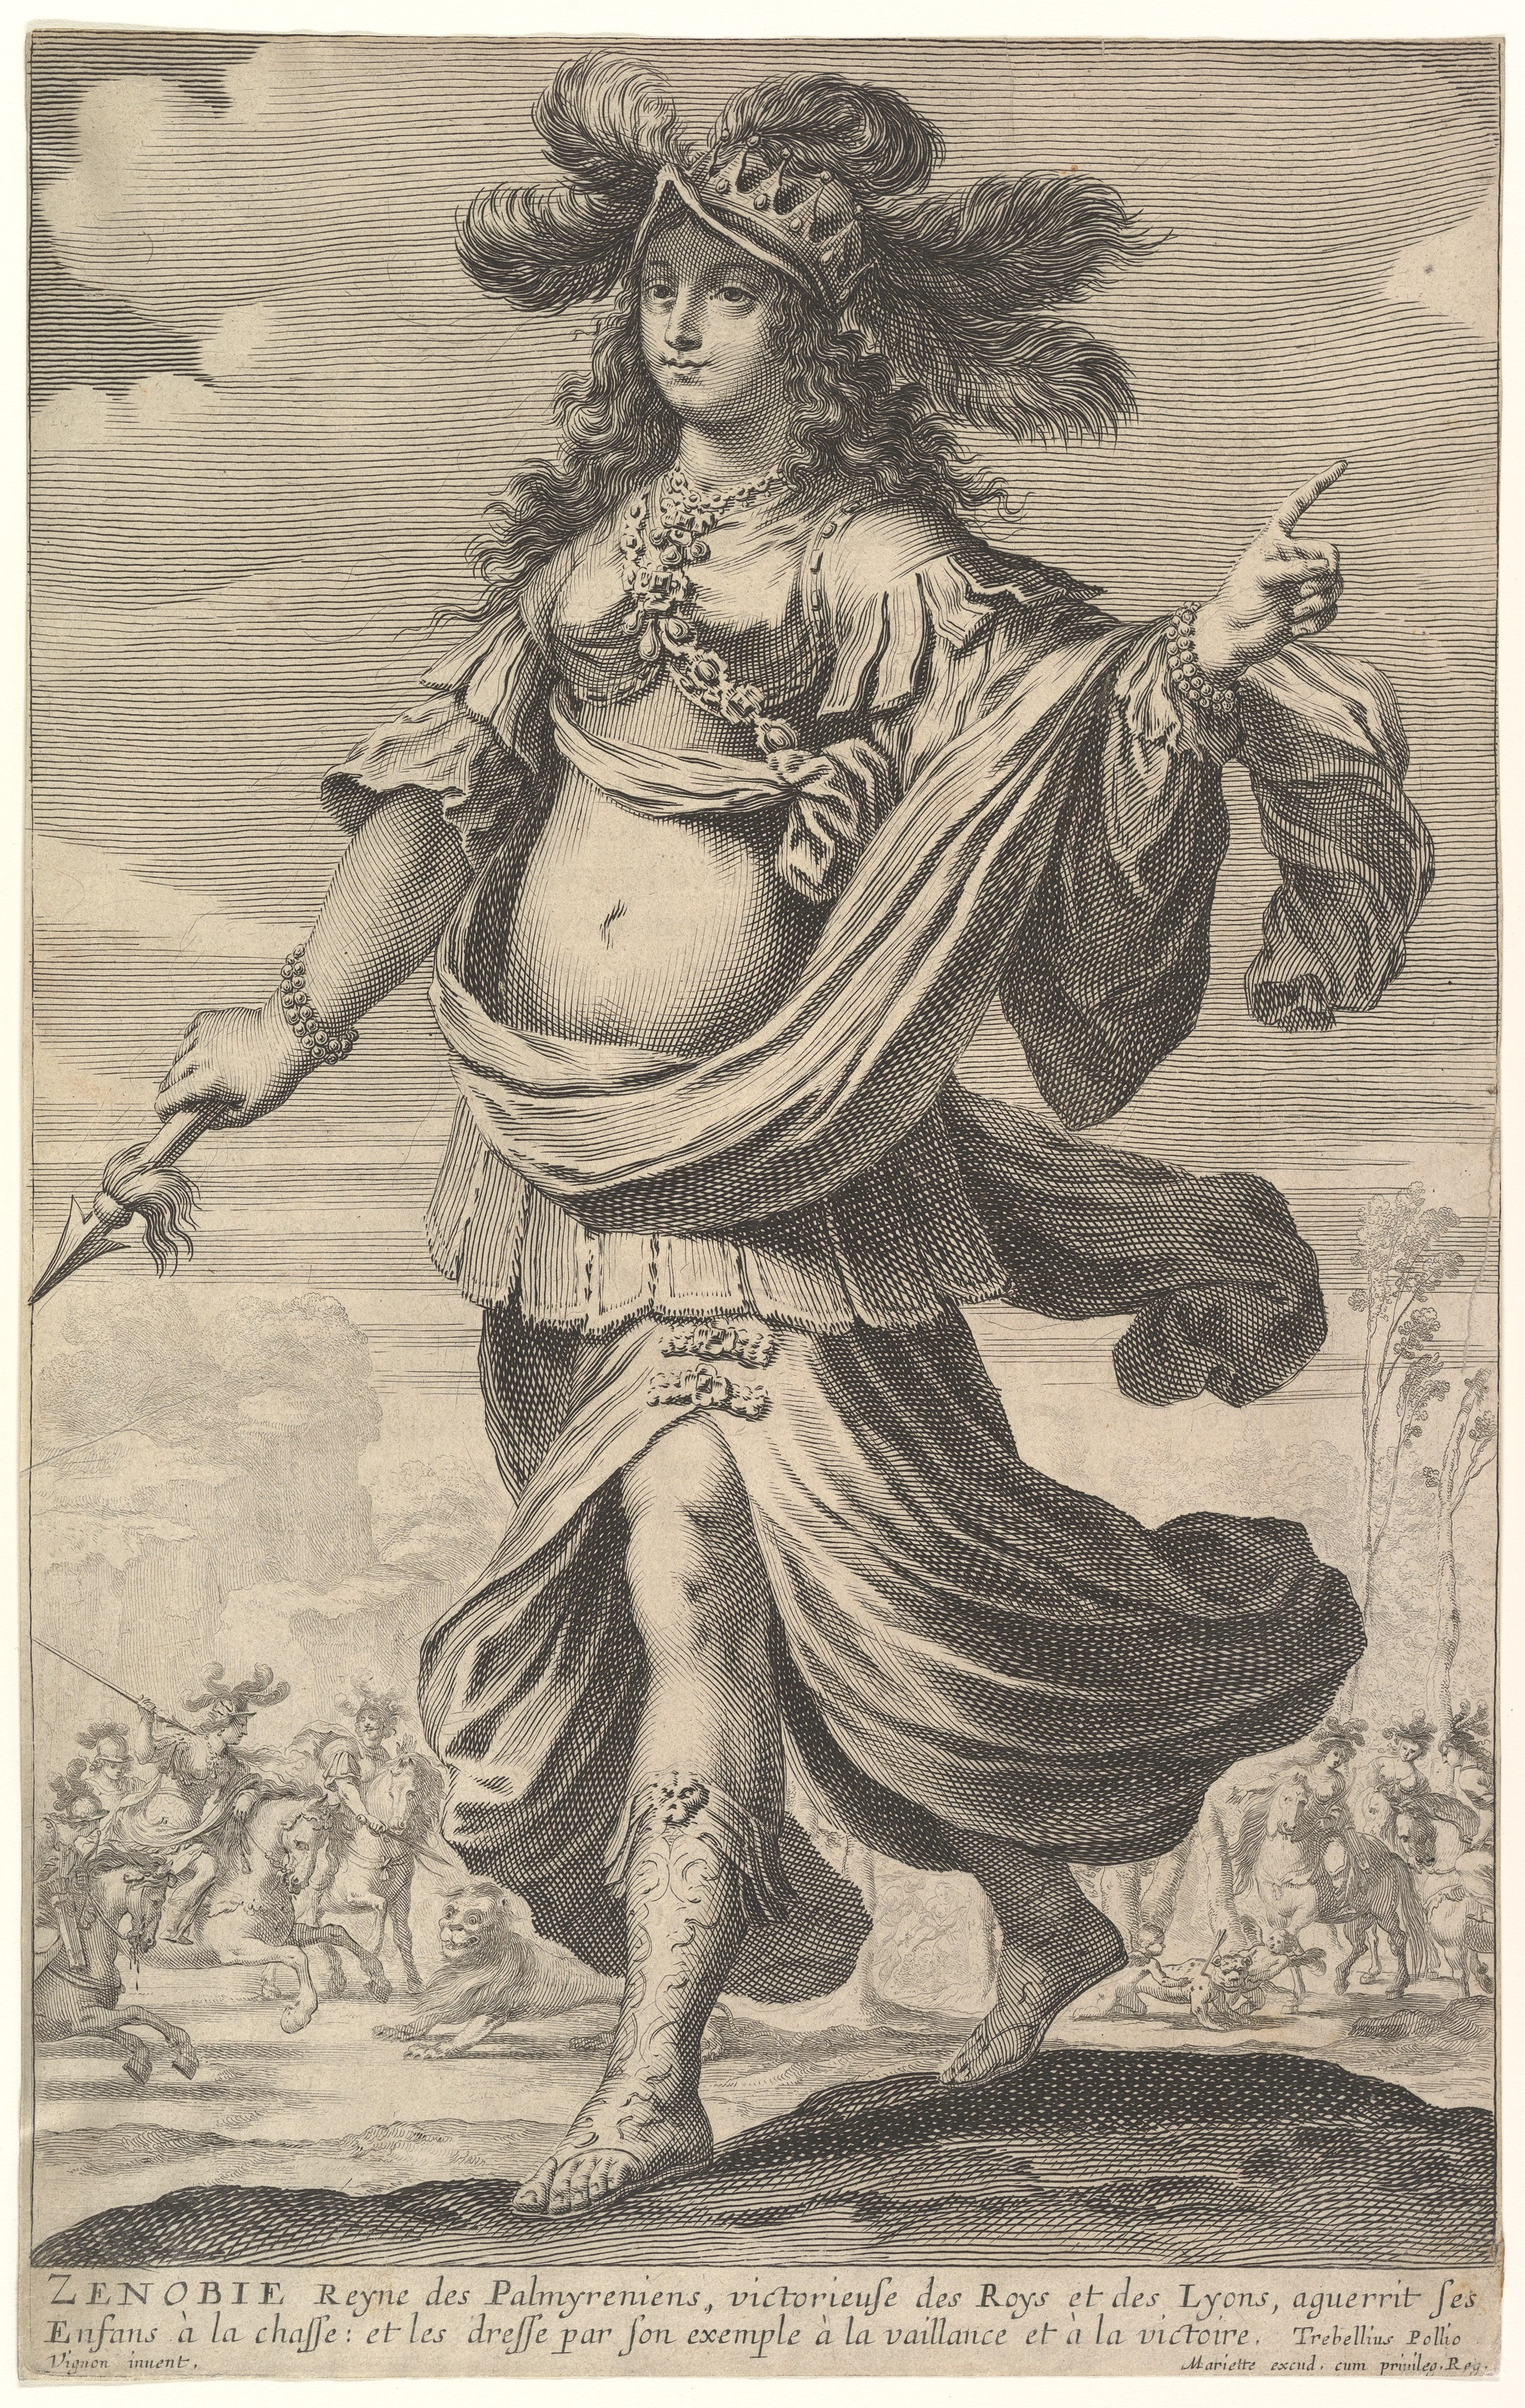 Zenobia,_an_illustration_from_Pierre_Le_Moyne's_'La_Gallerie_des_femmes_fortes'_MET_DP829038.jpg